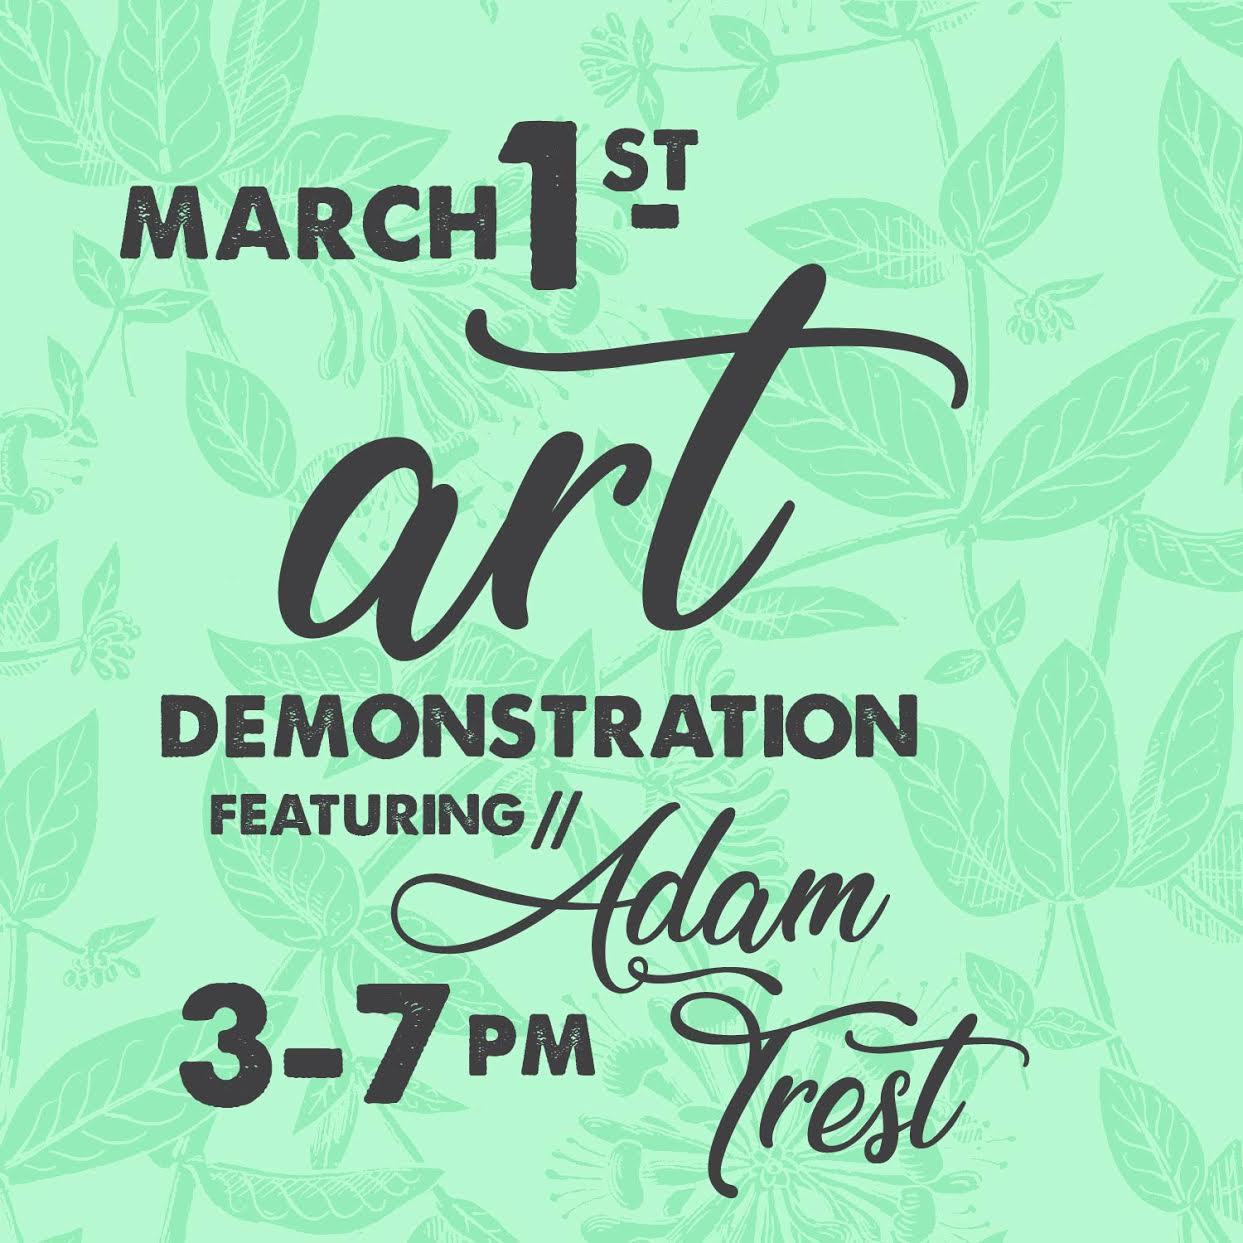 Adam Trest Caron Gallery Downtown Tupelo